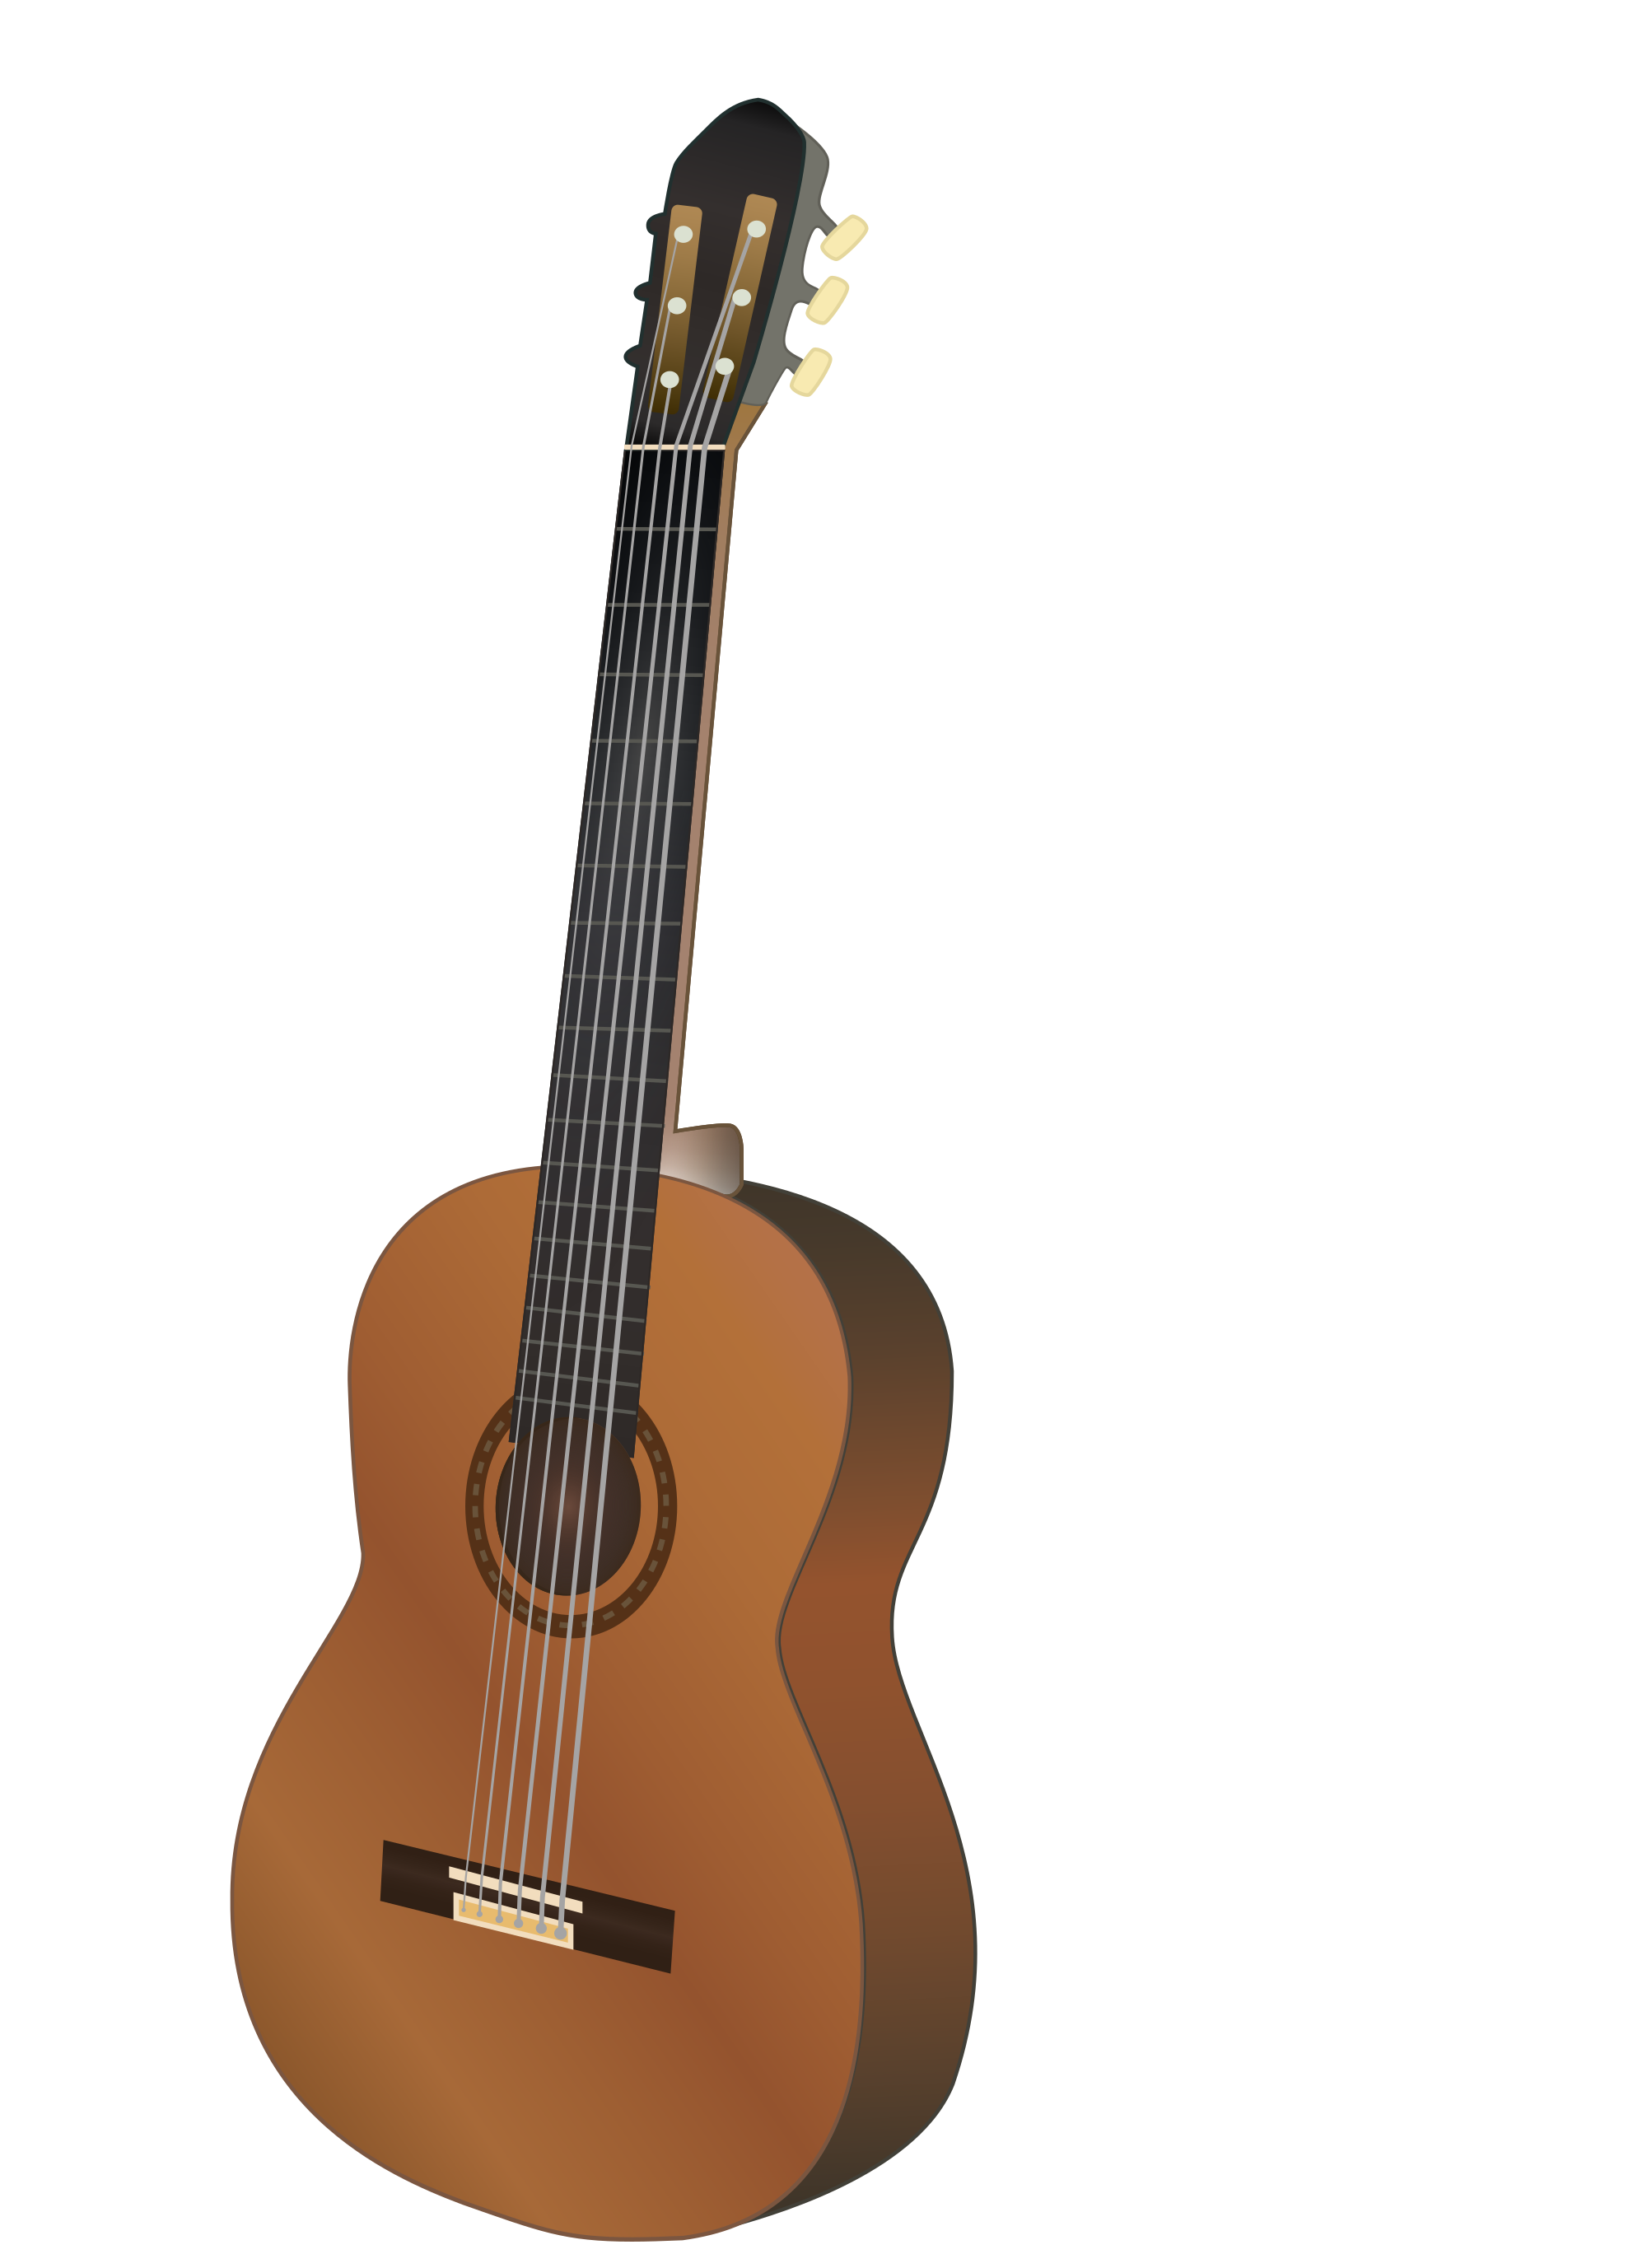 Acoustic HD PNG - 89258